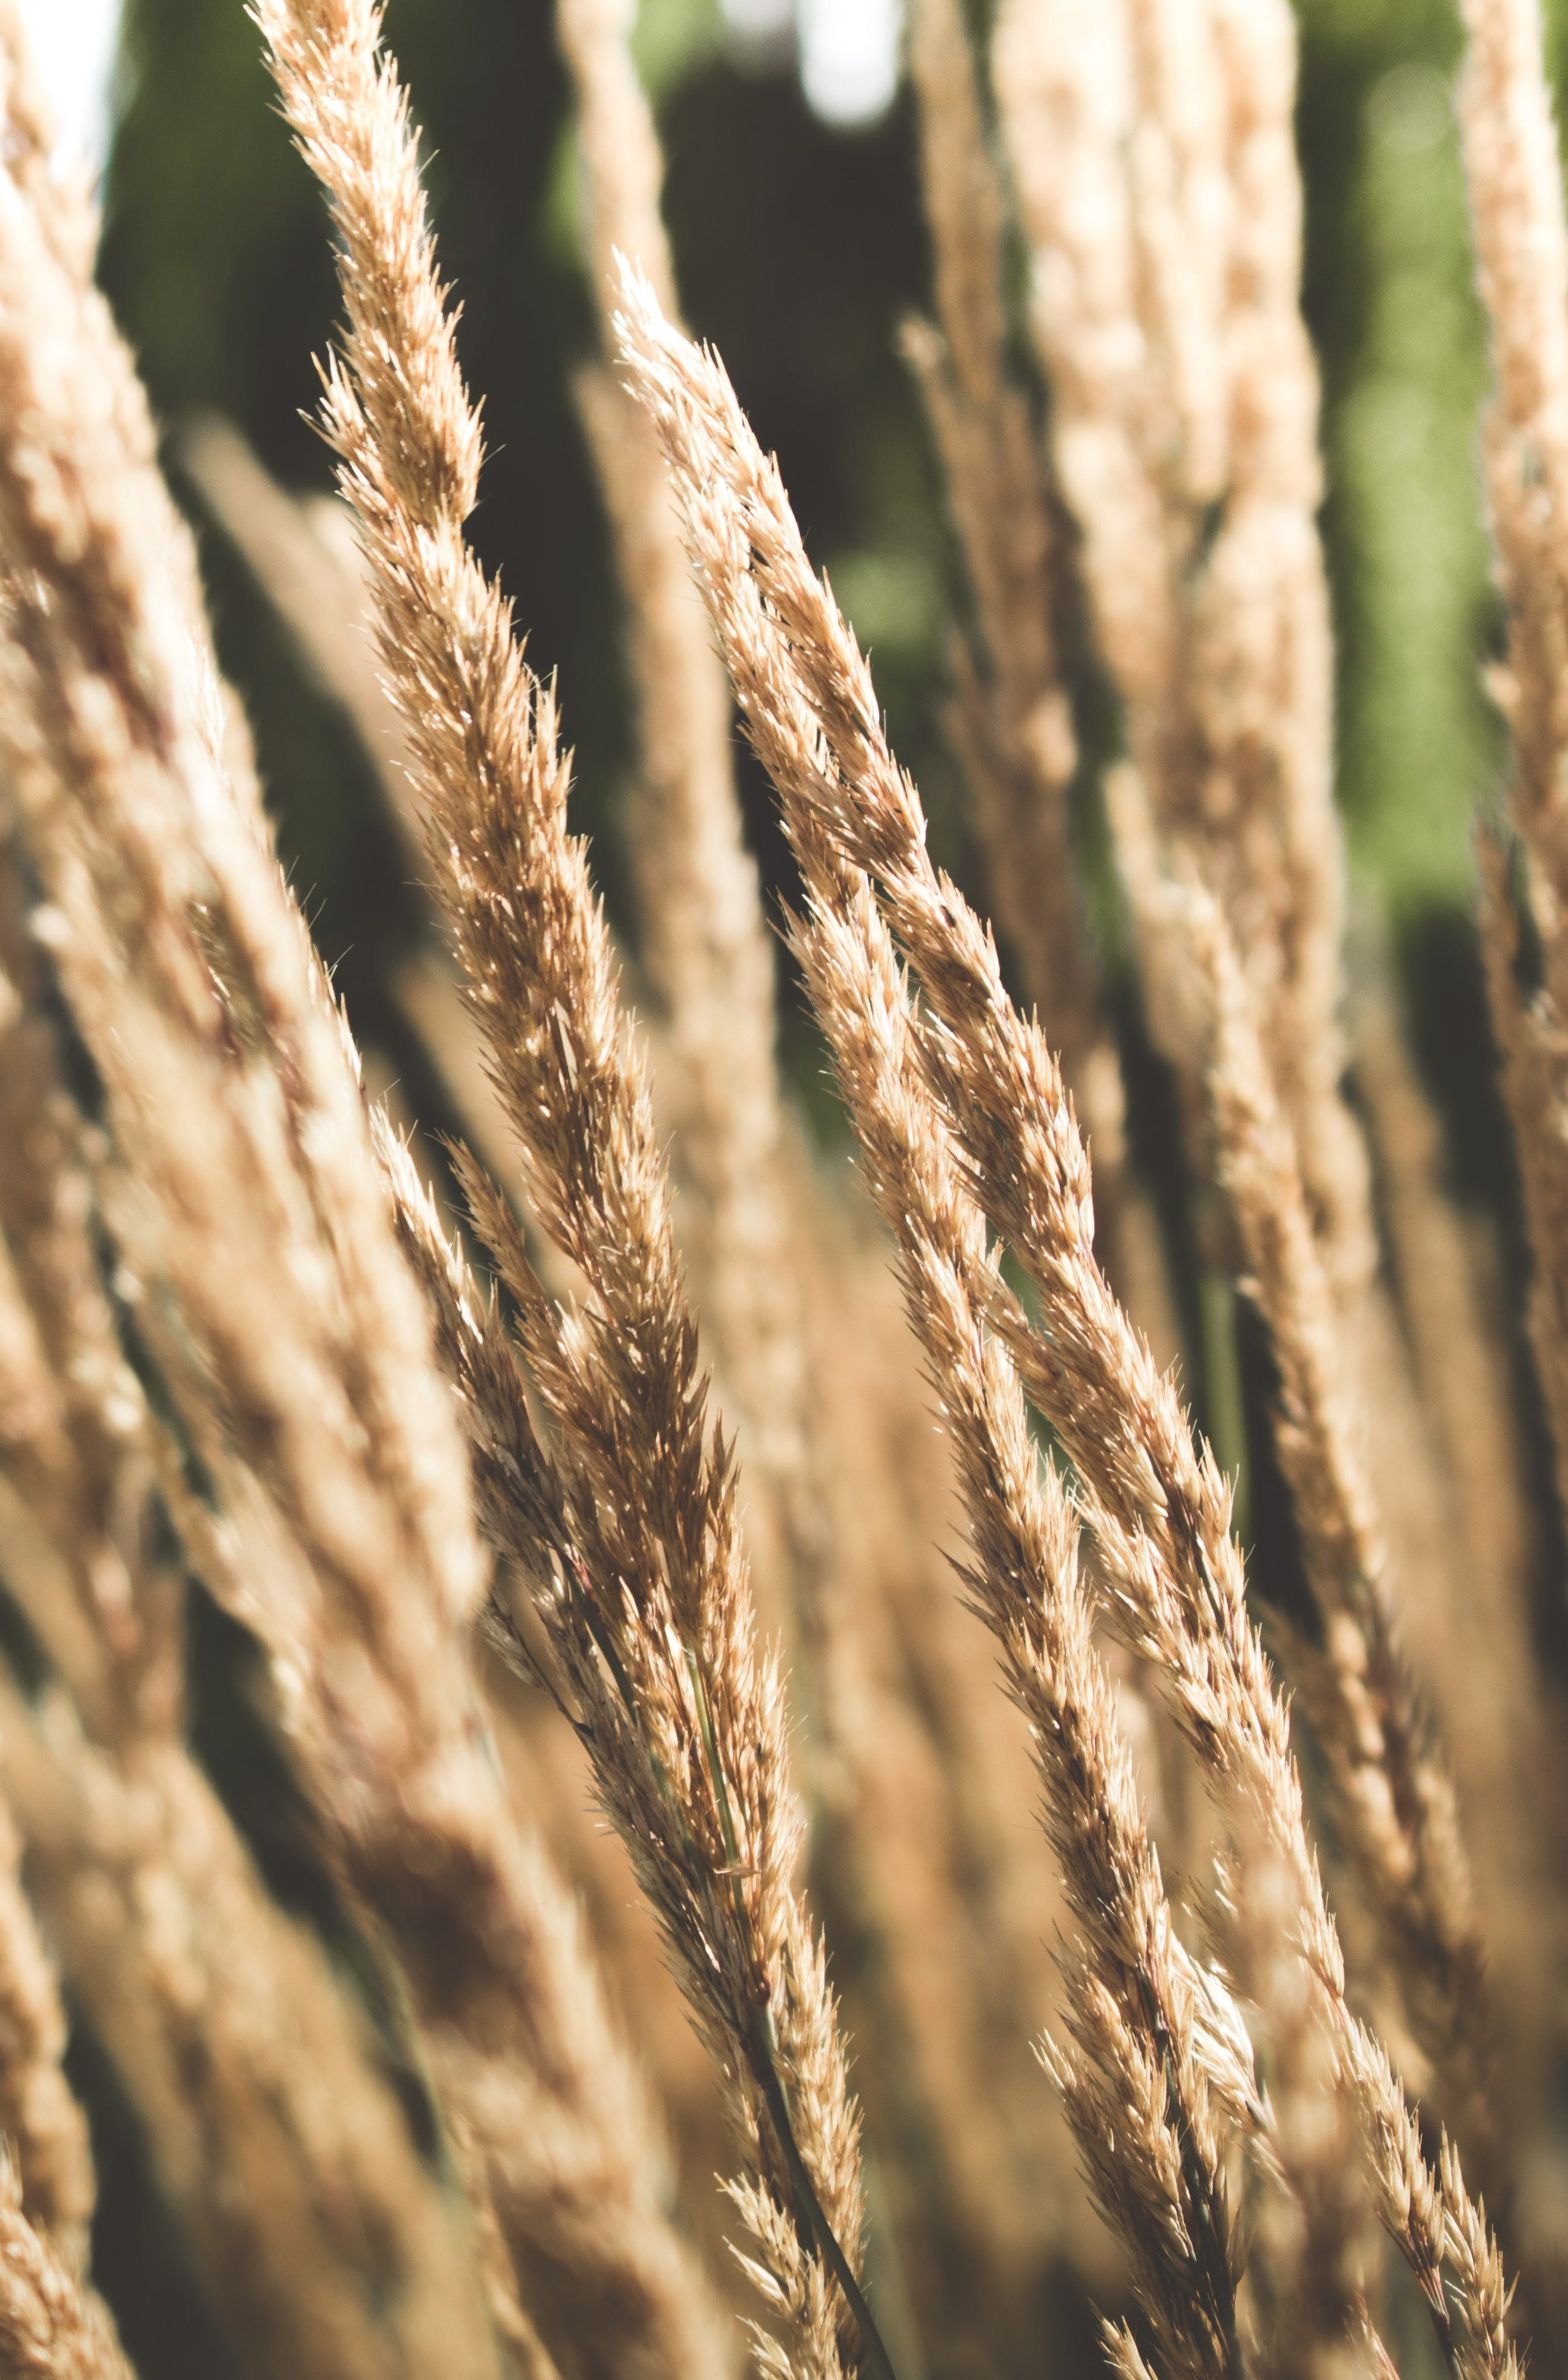 Free stock photo of plant, wheat